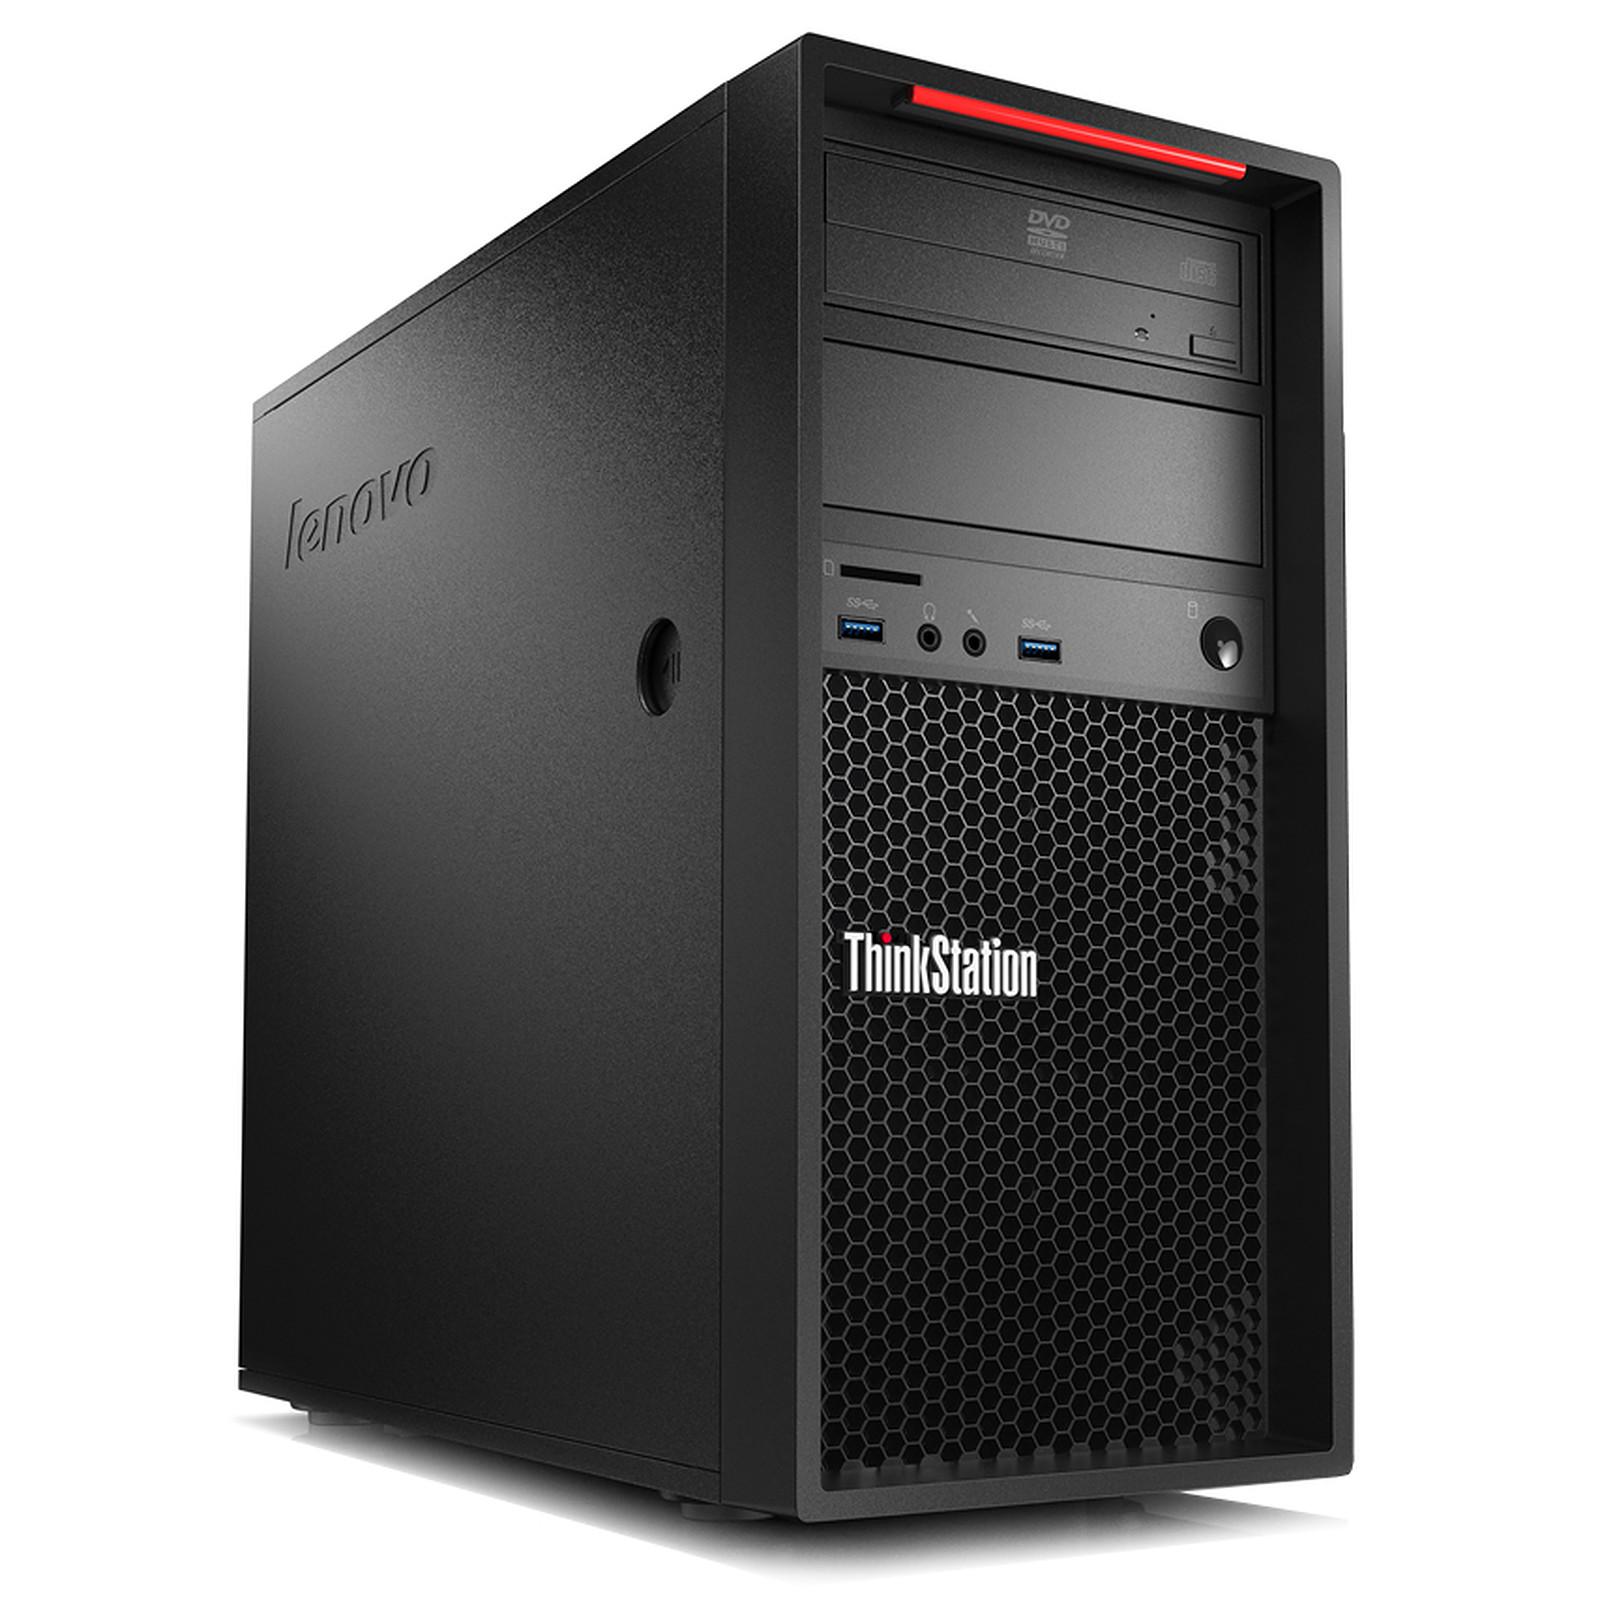 Lenovo ThinkStation P300 (30AH005MFR)